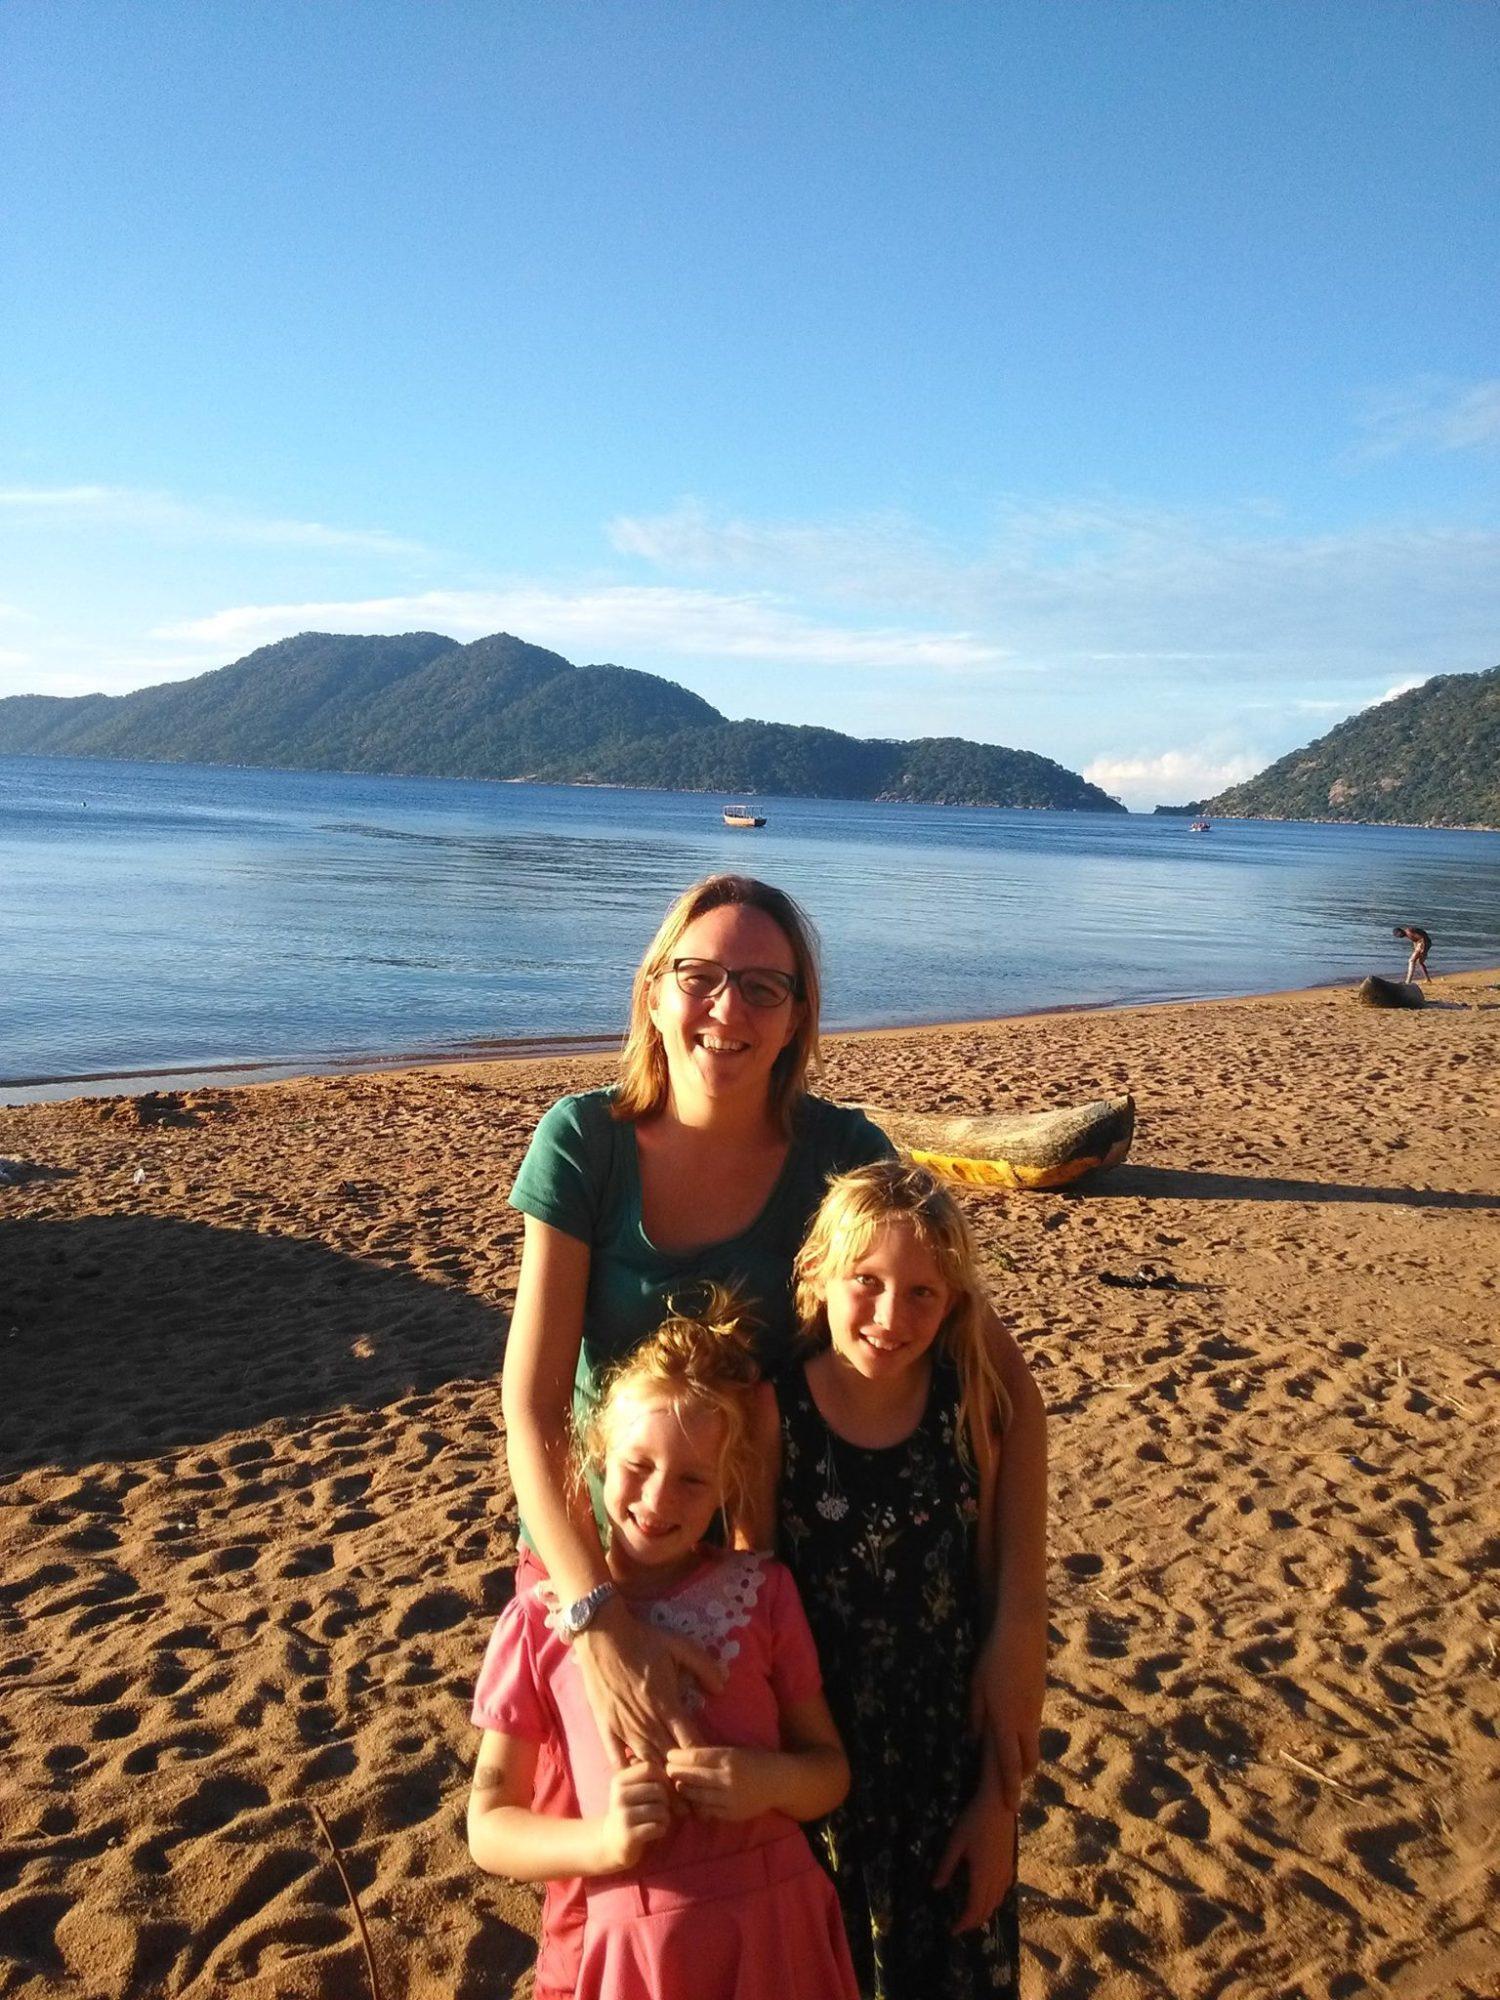 Global Health doctor #2 – Jeannette van Os